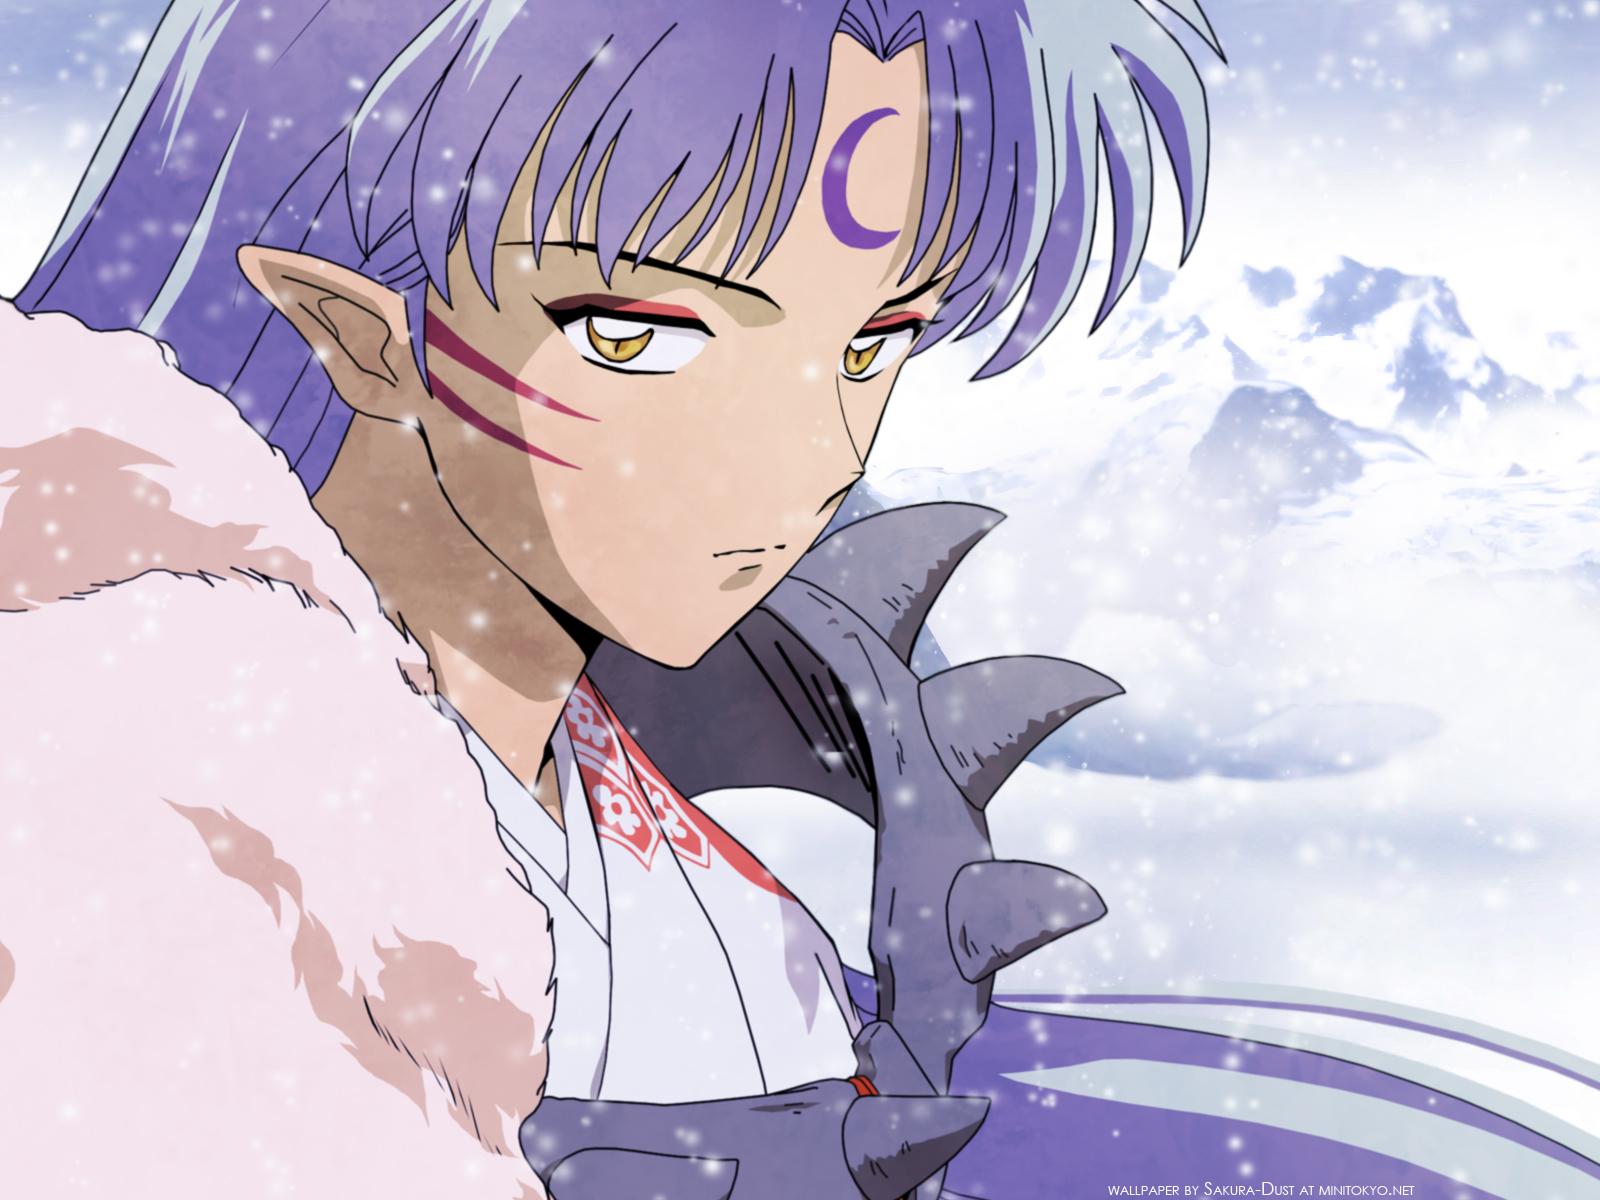 http://1.bp.blogspot.com/-5VKRCoRbGi4/TxcLeox5pRI/AAAAAAAABHc/tfJJ-9Ldc2o/s1600/Minitokyo_Anime_Wallpapers_Inu-Yasha_323957.jpg